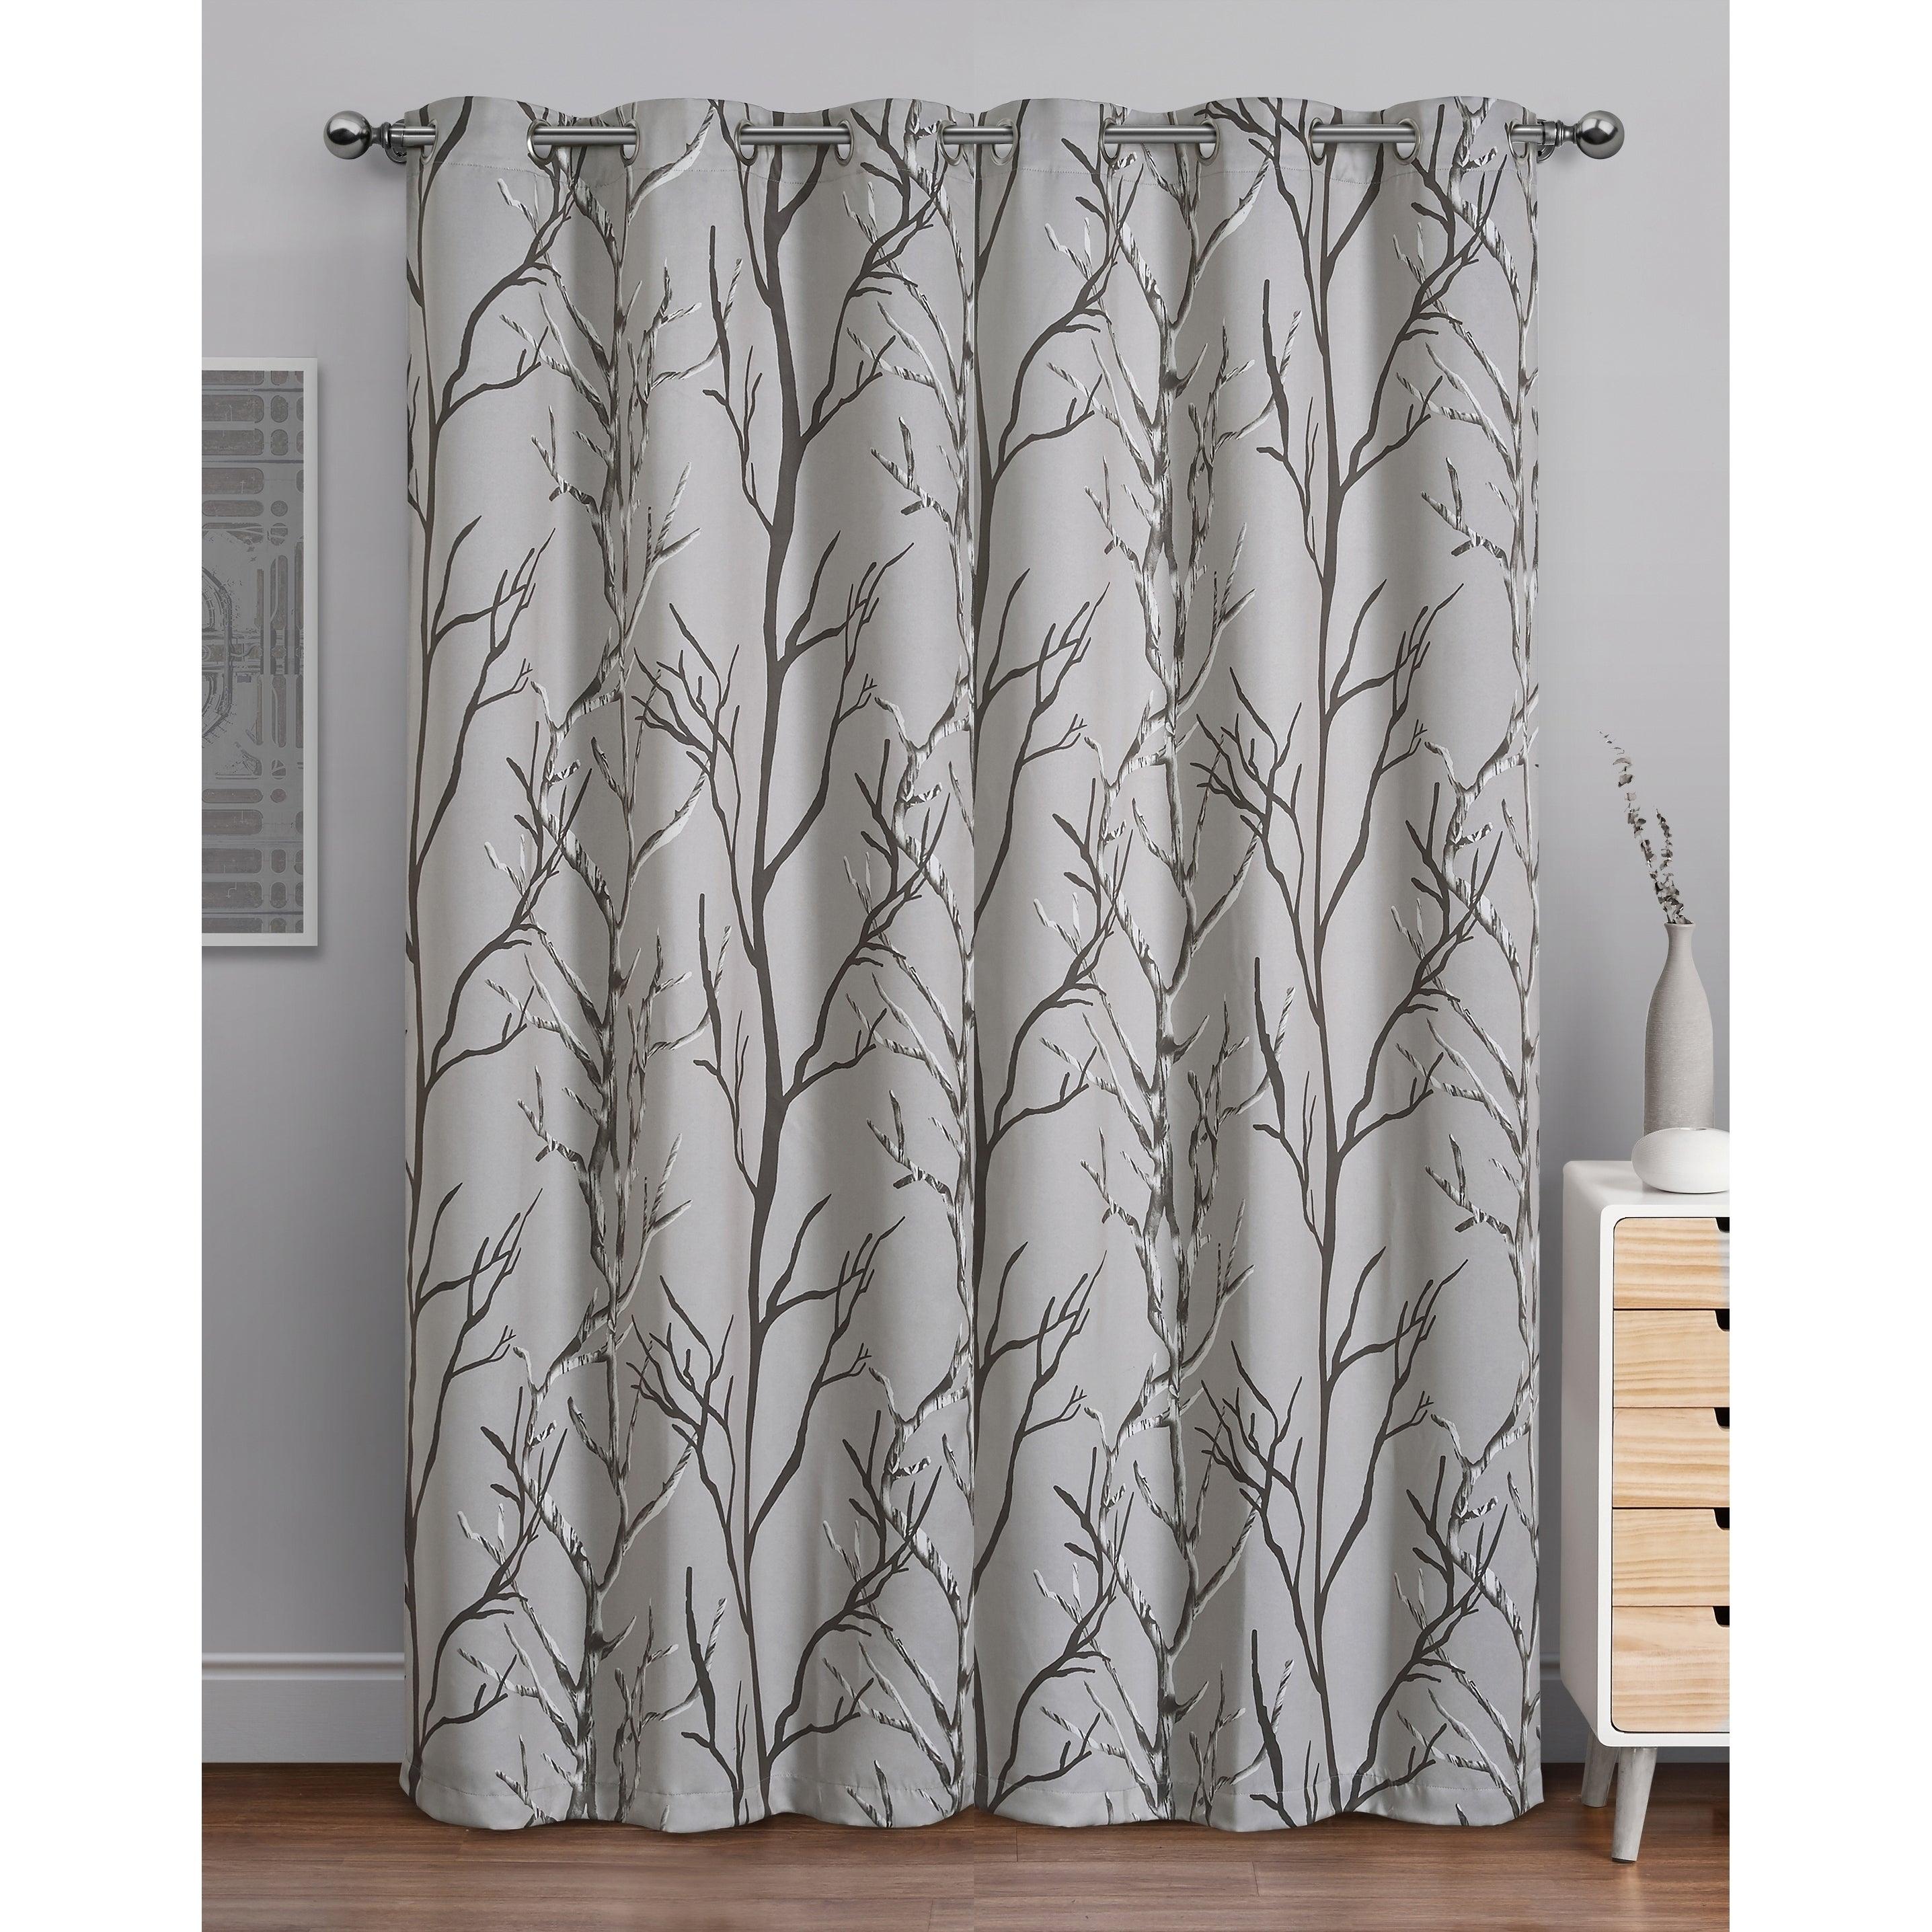 Vcny Home Keyes Blackout Single Curtain Panel Throughout Keyes Blackout Single Curtain Panels (View 2 of 20)